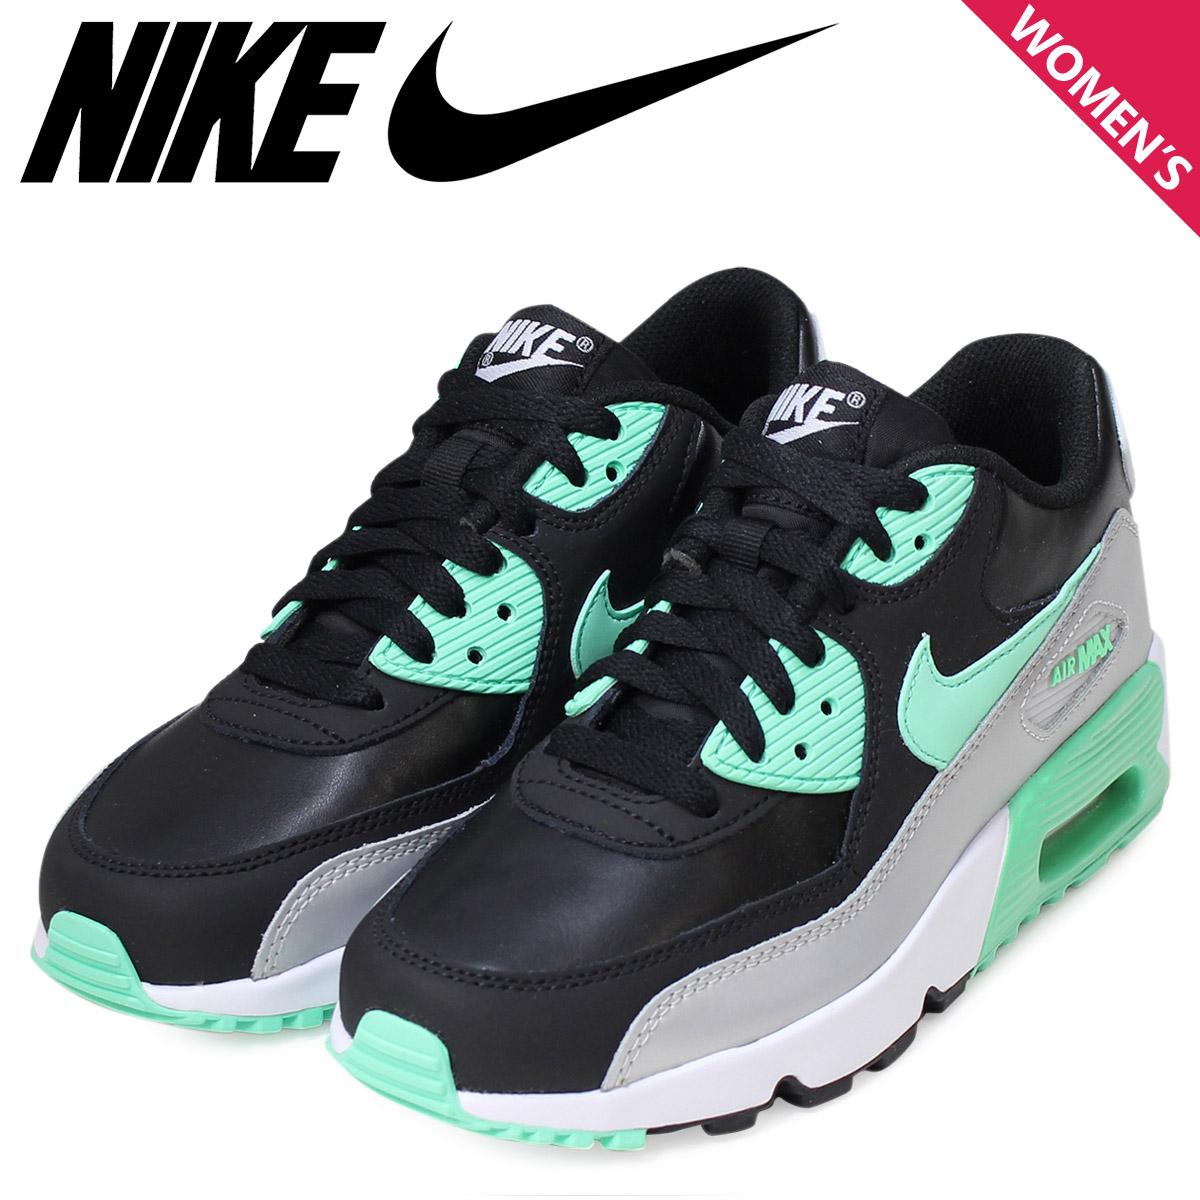 Nike NIKE Air Max Lady's sneakers AIR MAX 90 LTR GS Air Max 833,376-001  shoes black [1/13 Shinnyu load]